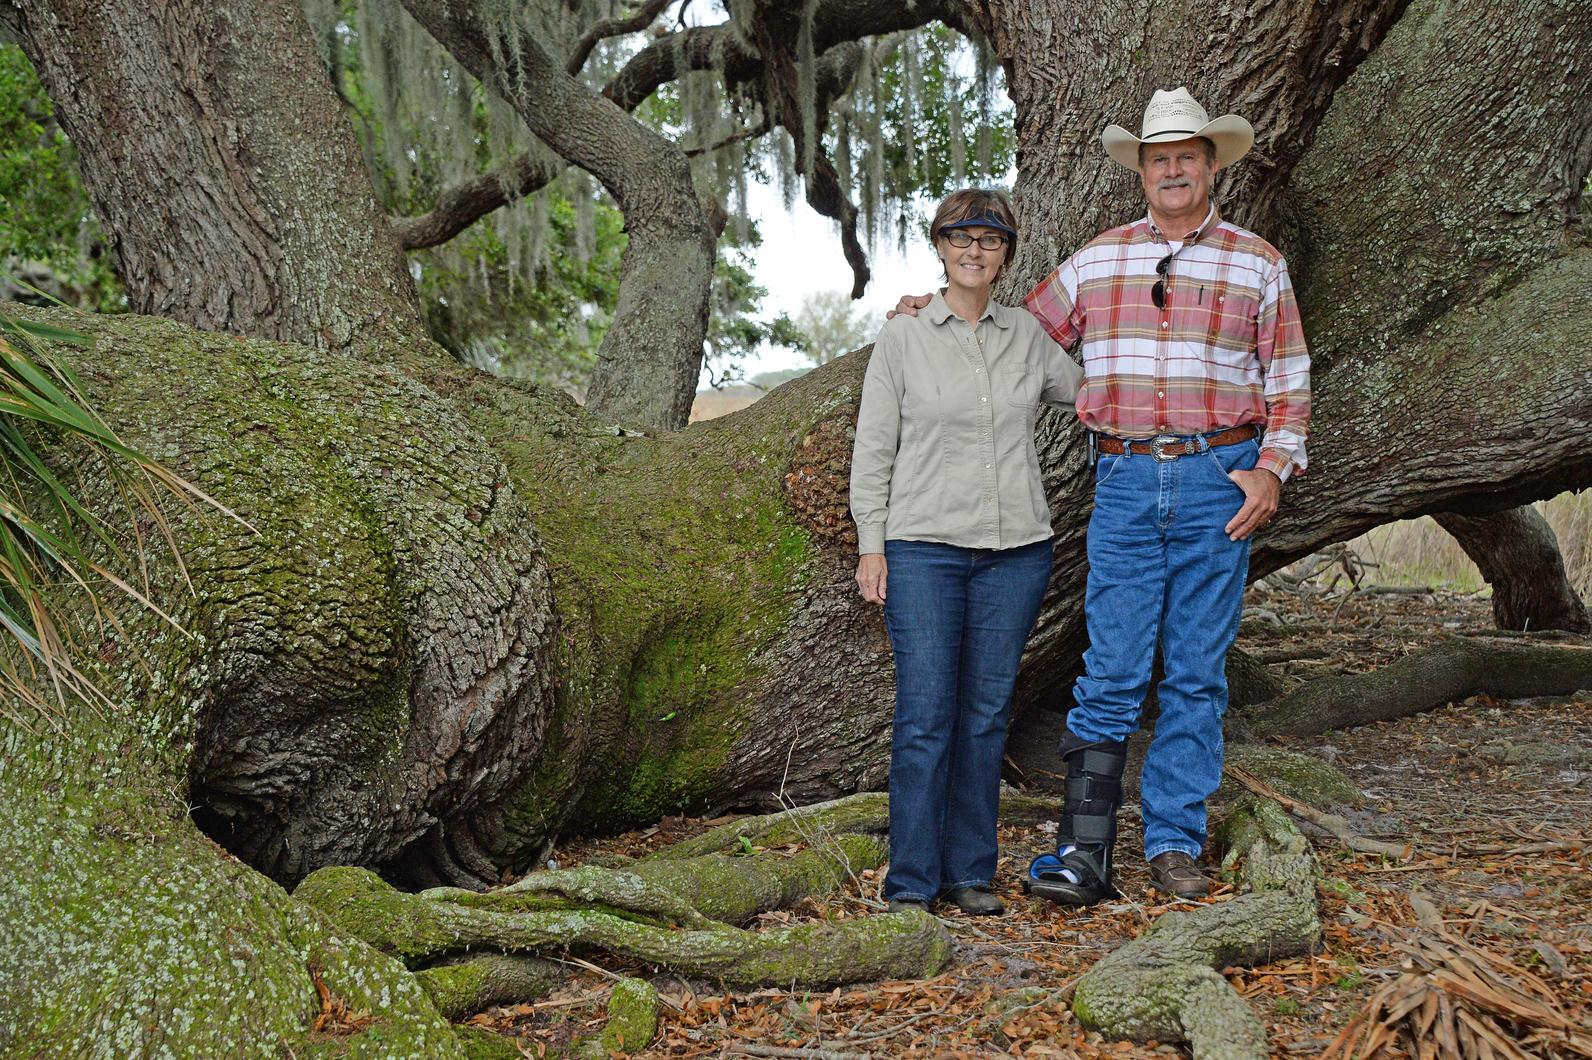 audubon florida presents 2016 sustainable rancher award to